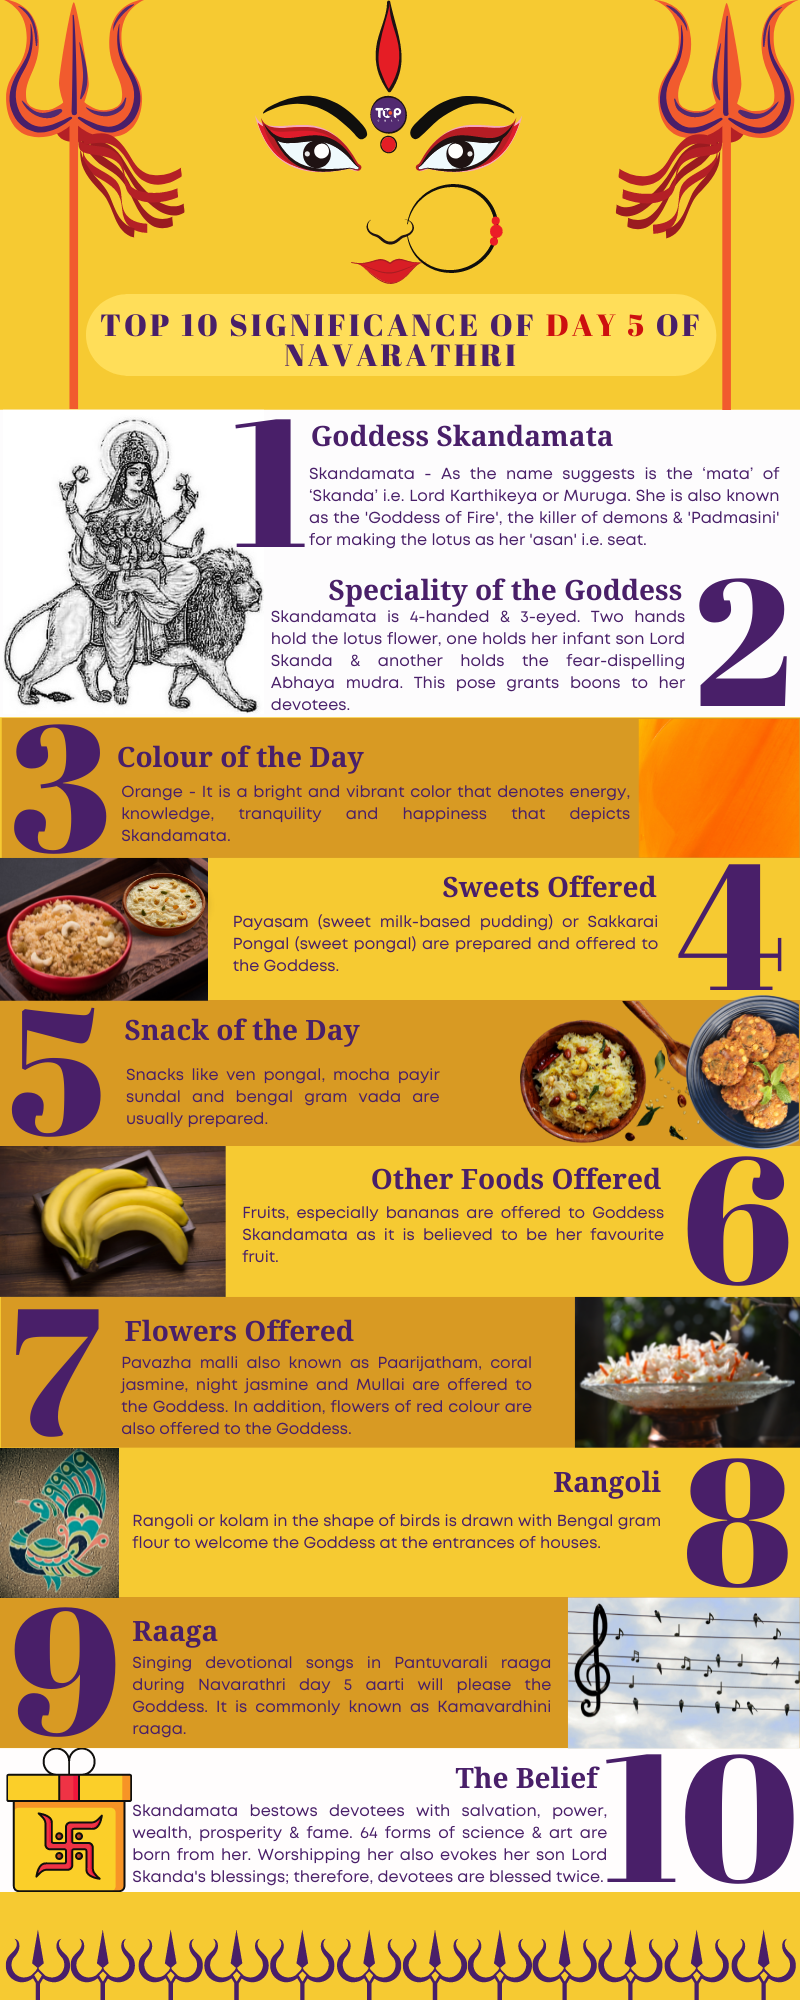 Significance of Day 5 of Navarathri